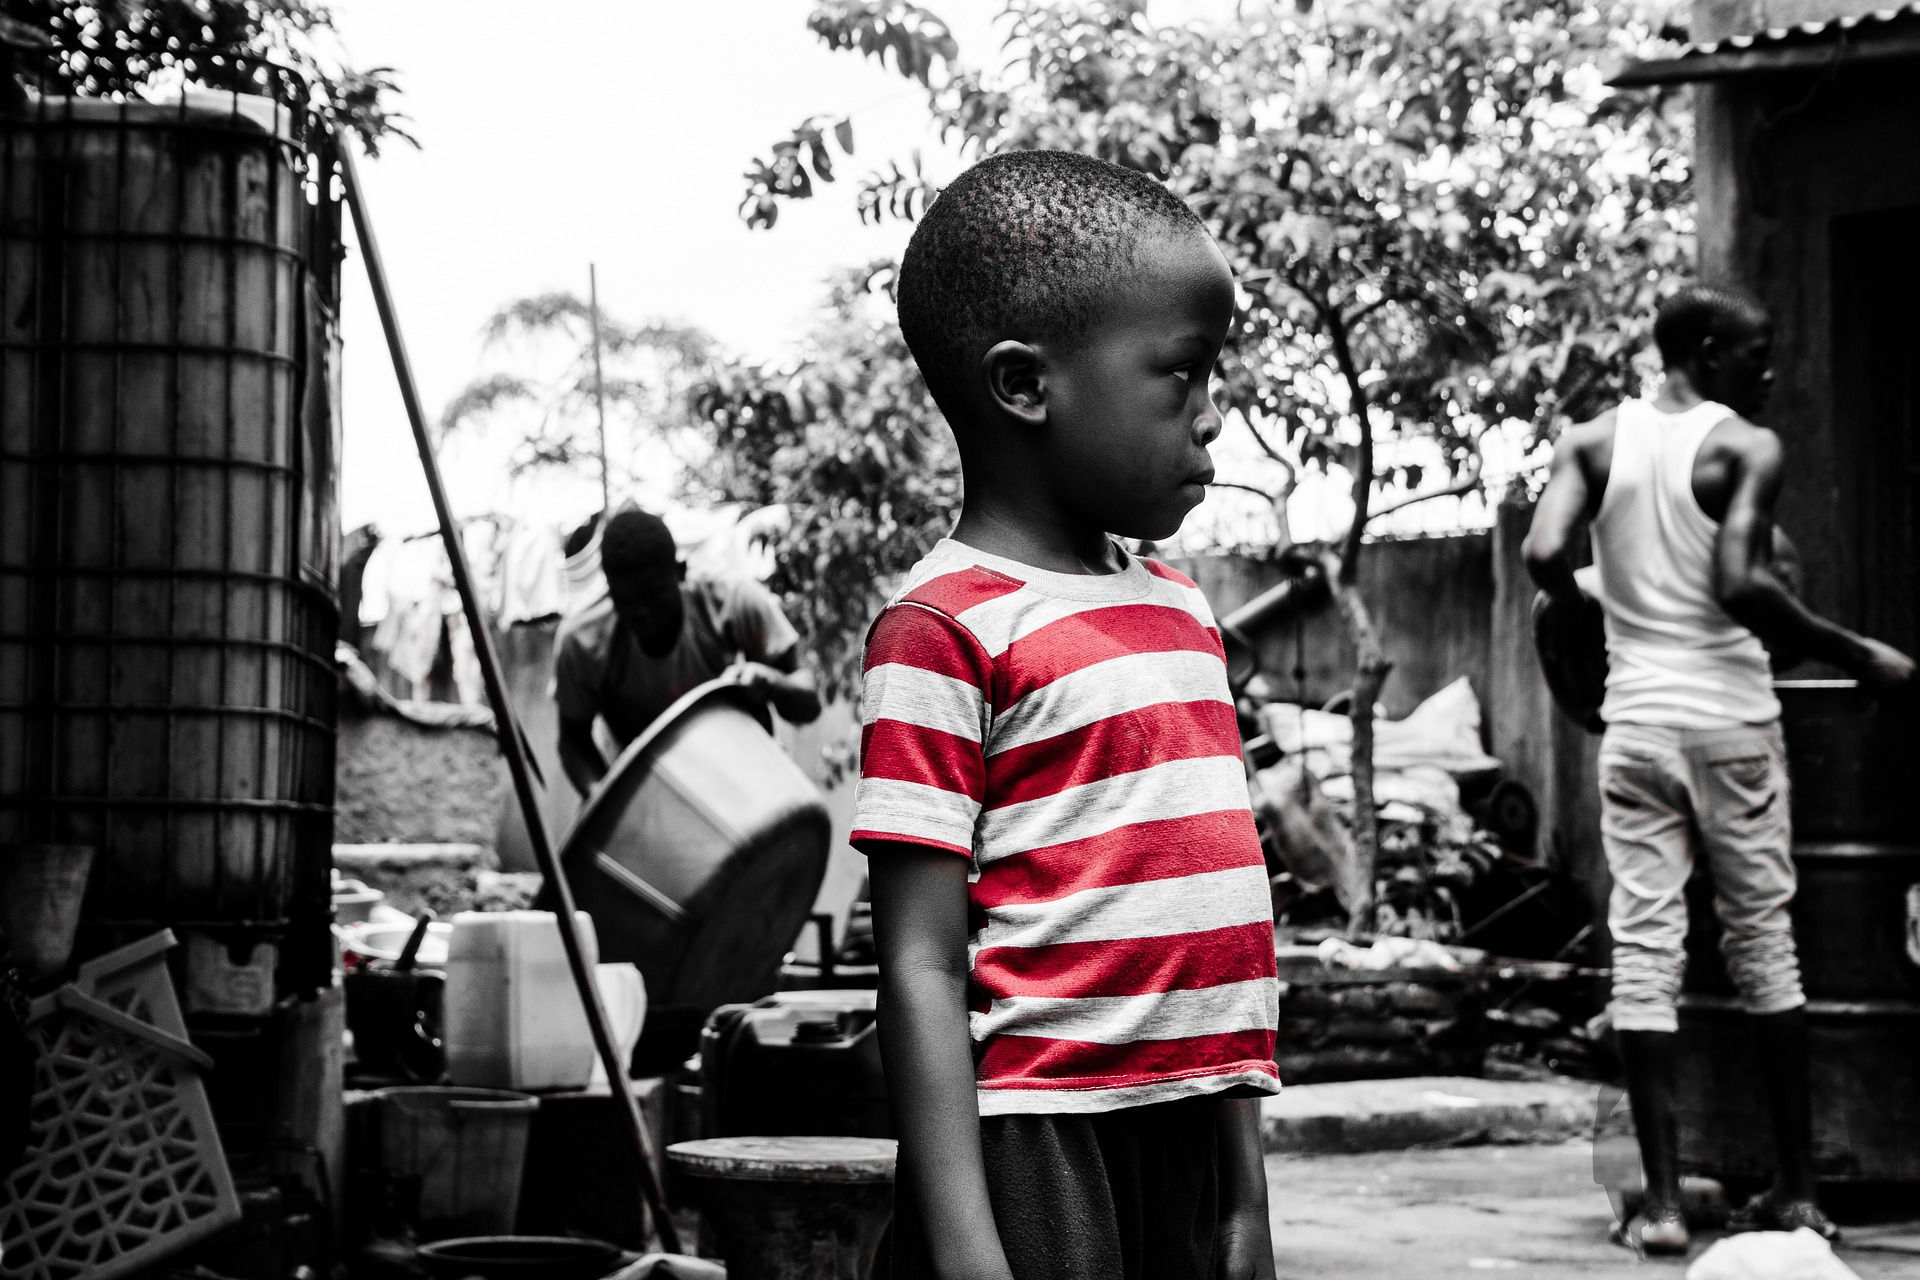 voluntariado social en africa